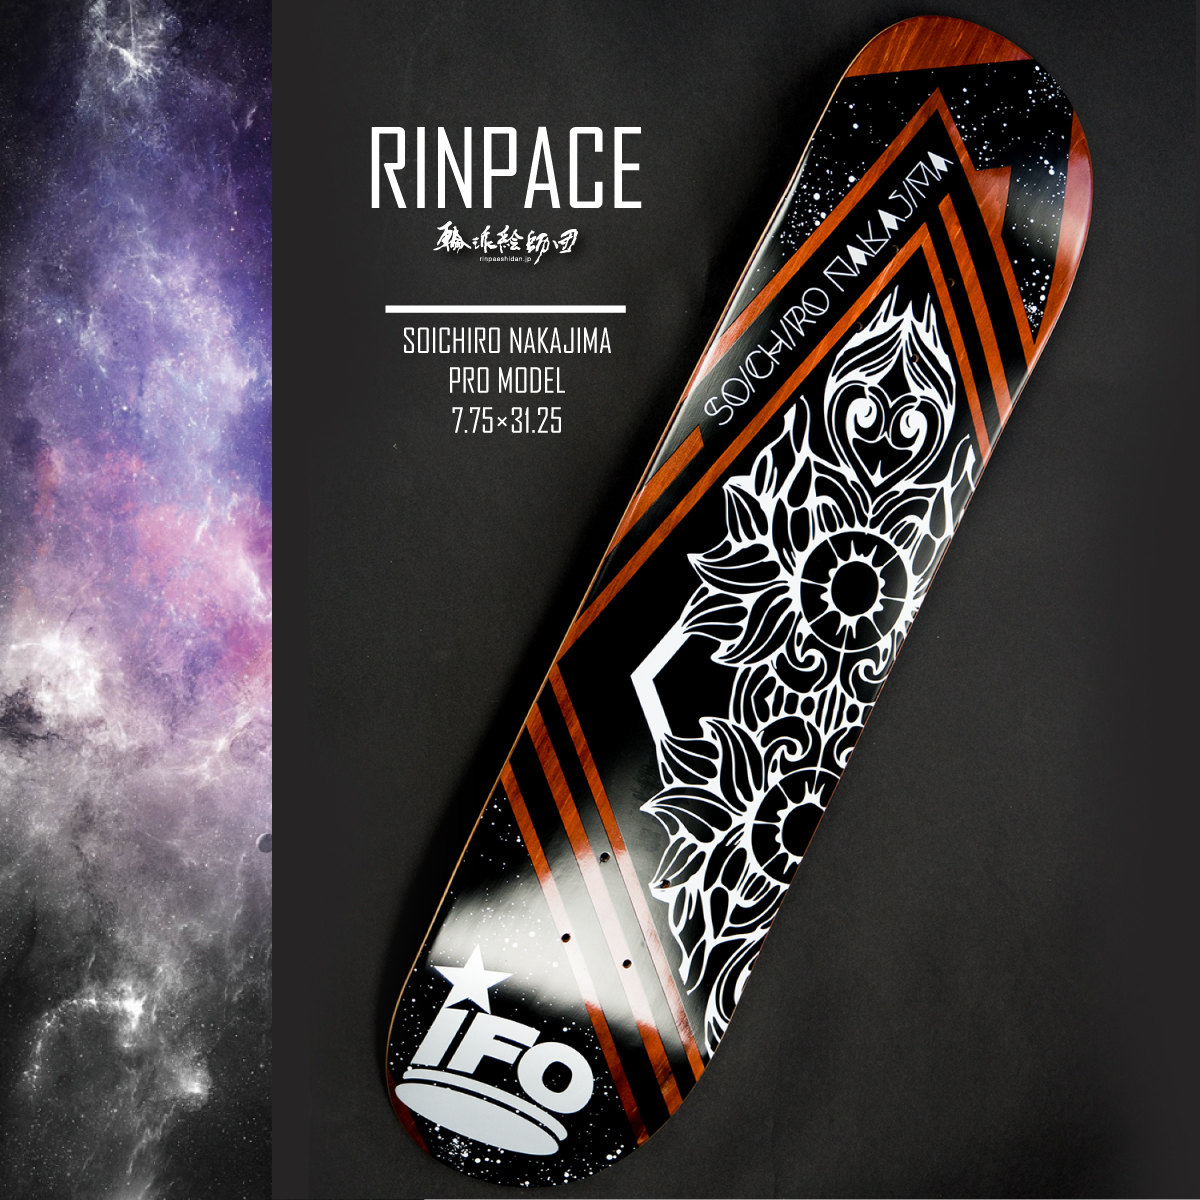 RINPACE_insta_01